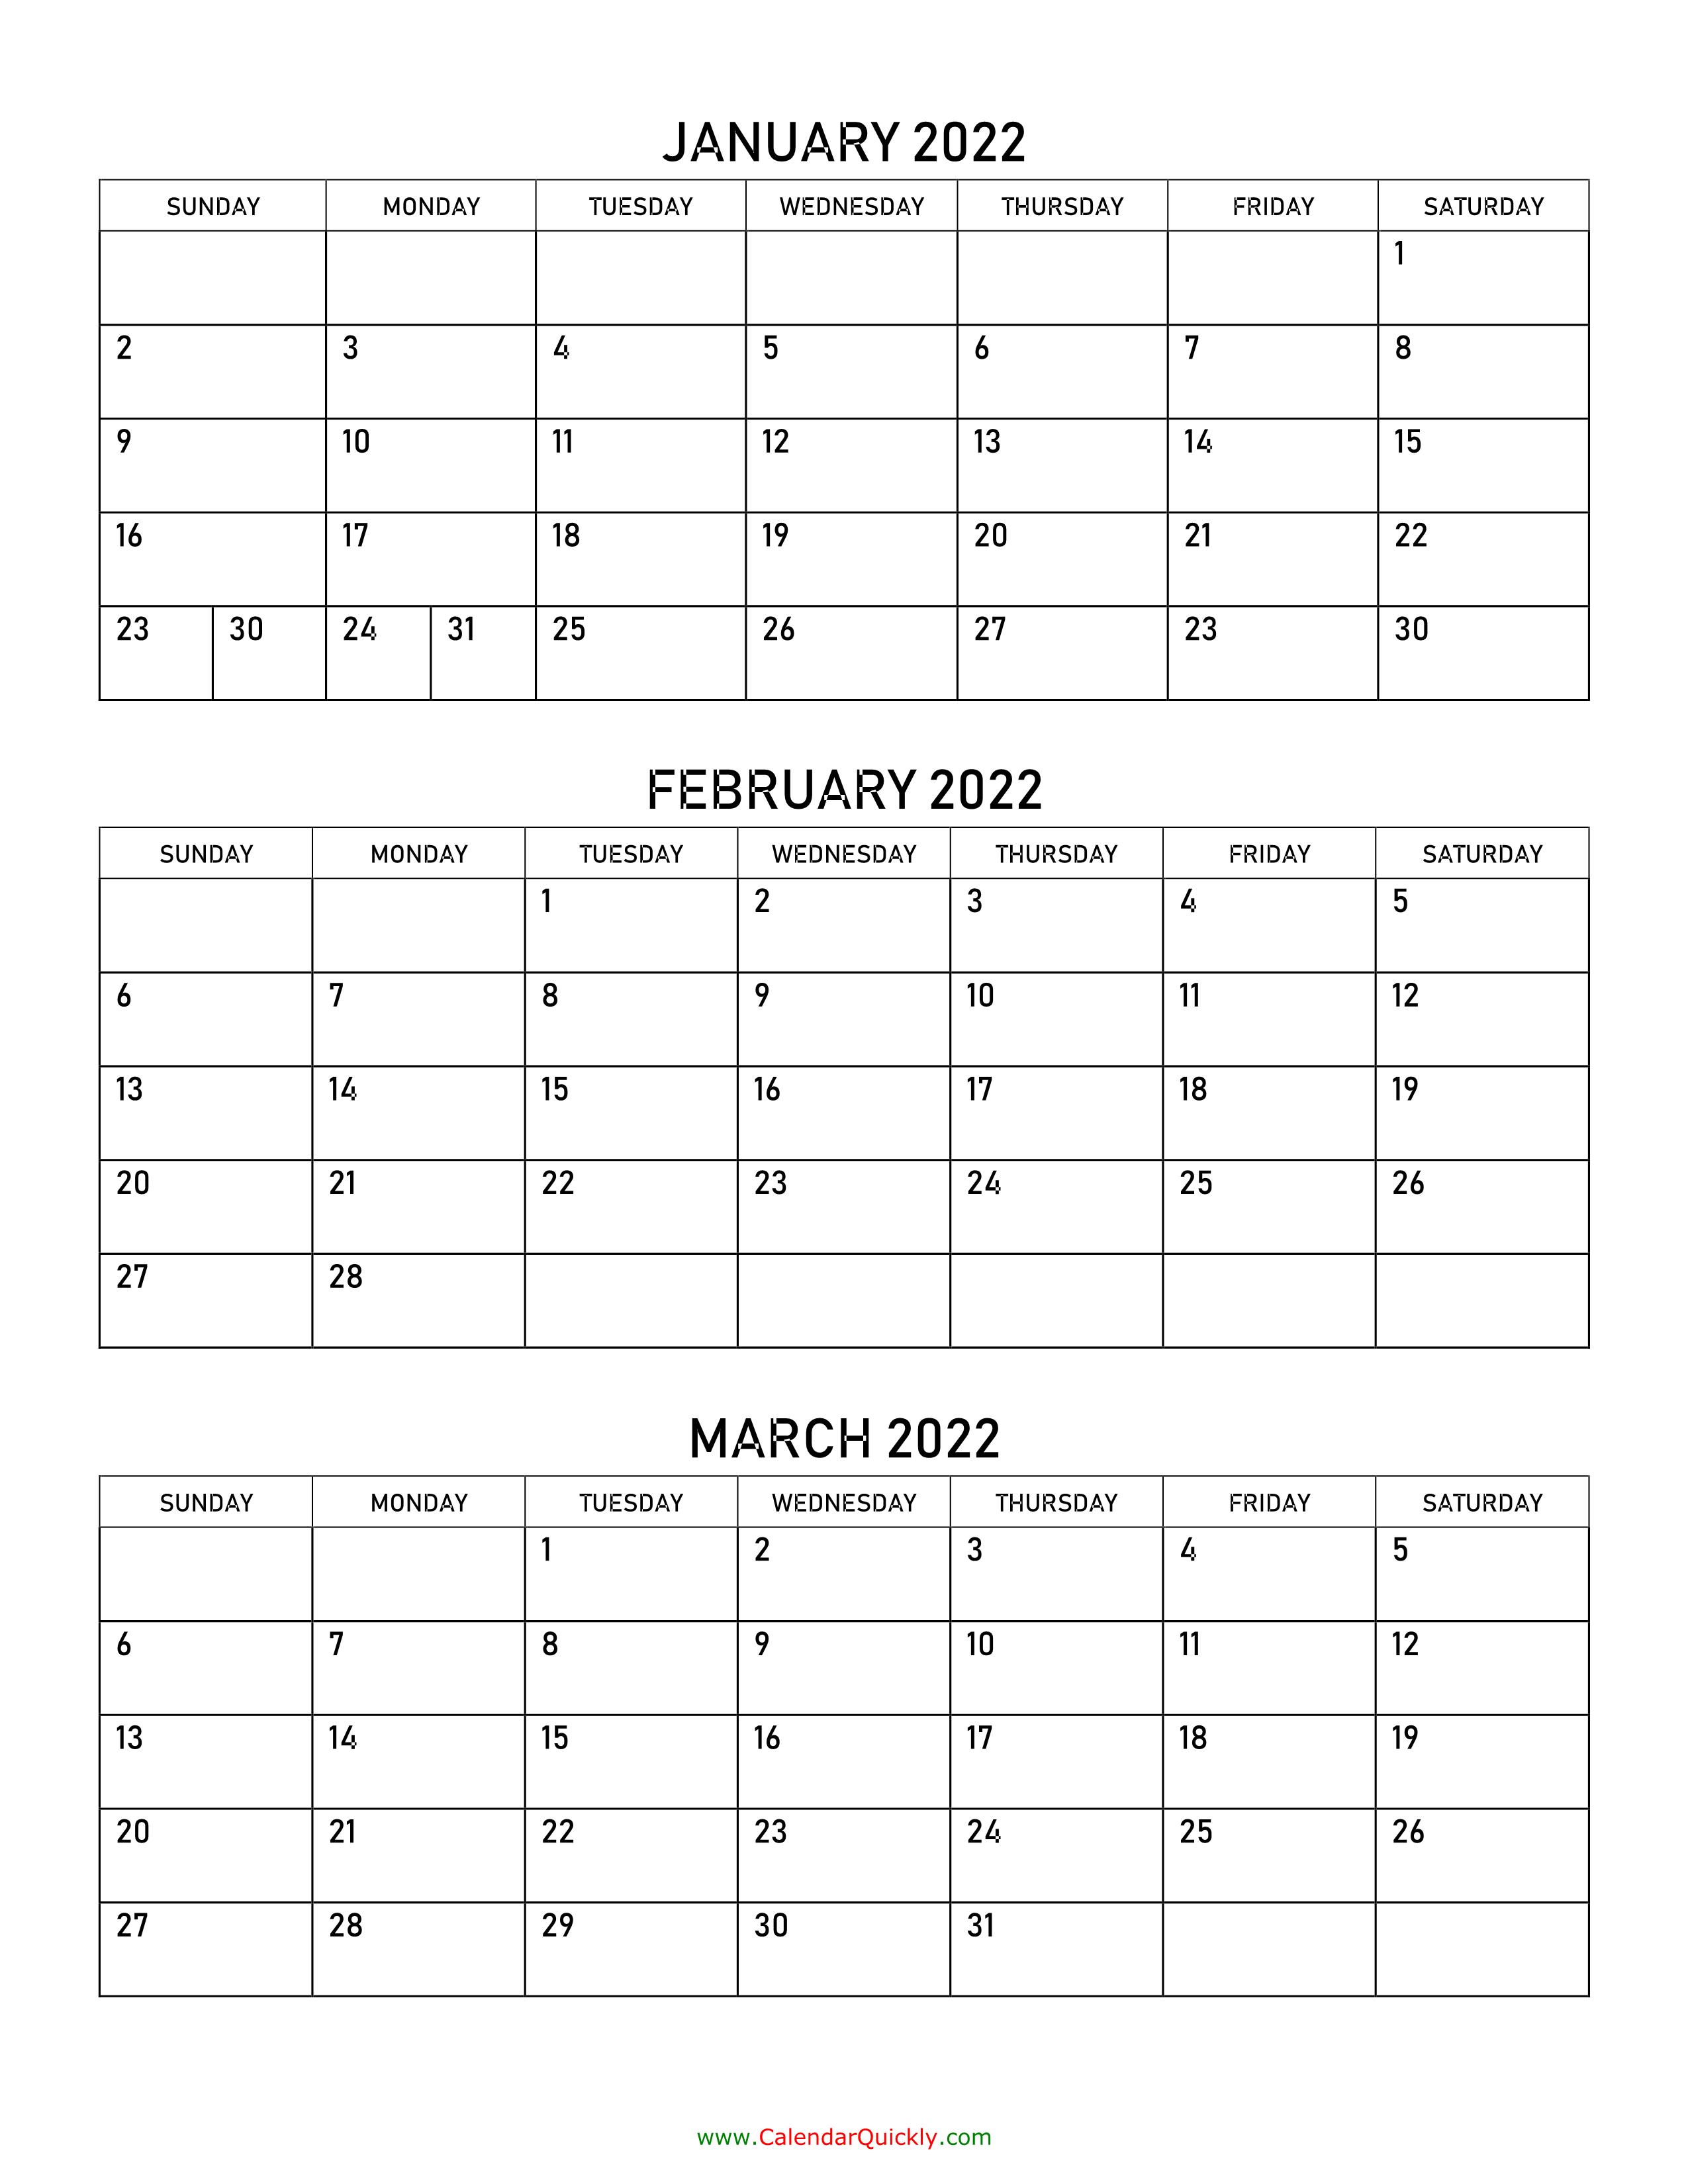 January To March 2022 Calendar | Calendar Quickly With Regard To March April 2022 Calendar Print